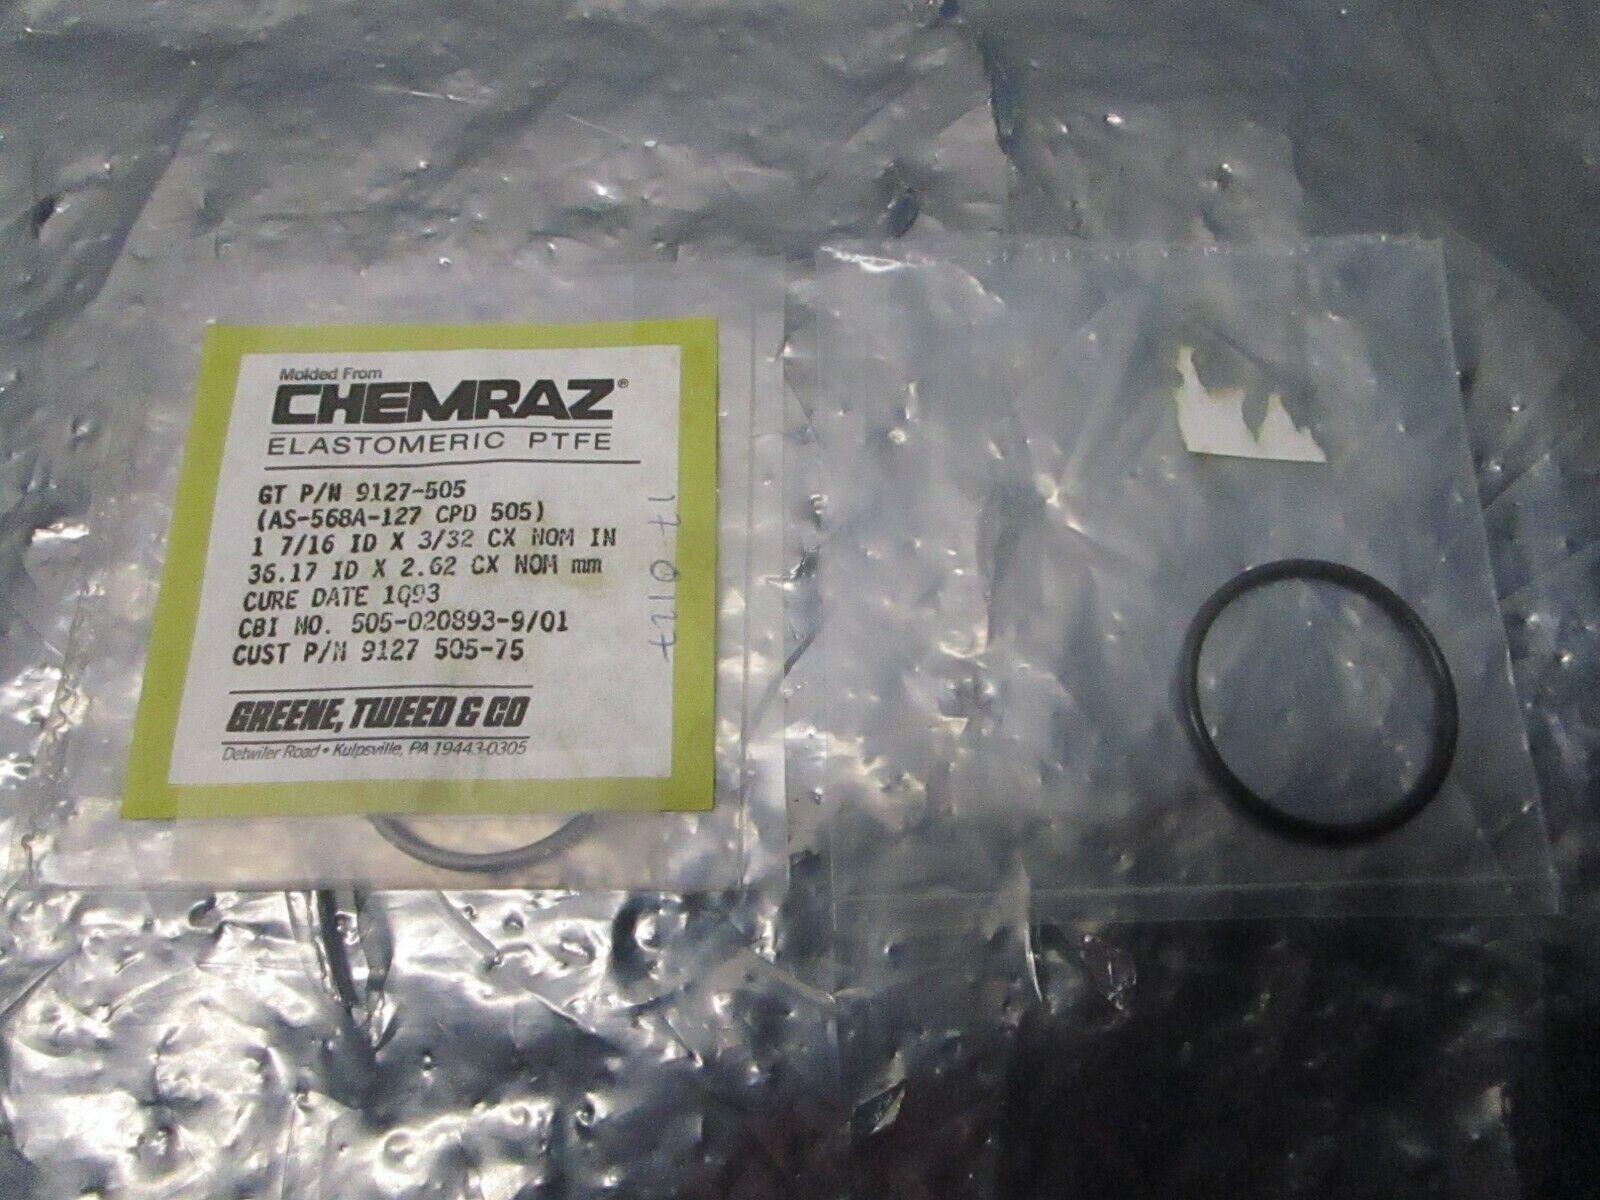 2 Greene Tweed AS-568A-127 Chemraz Oring, CPD 505, 9127-505, 101301